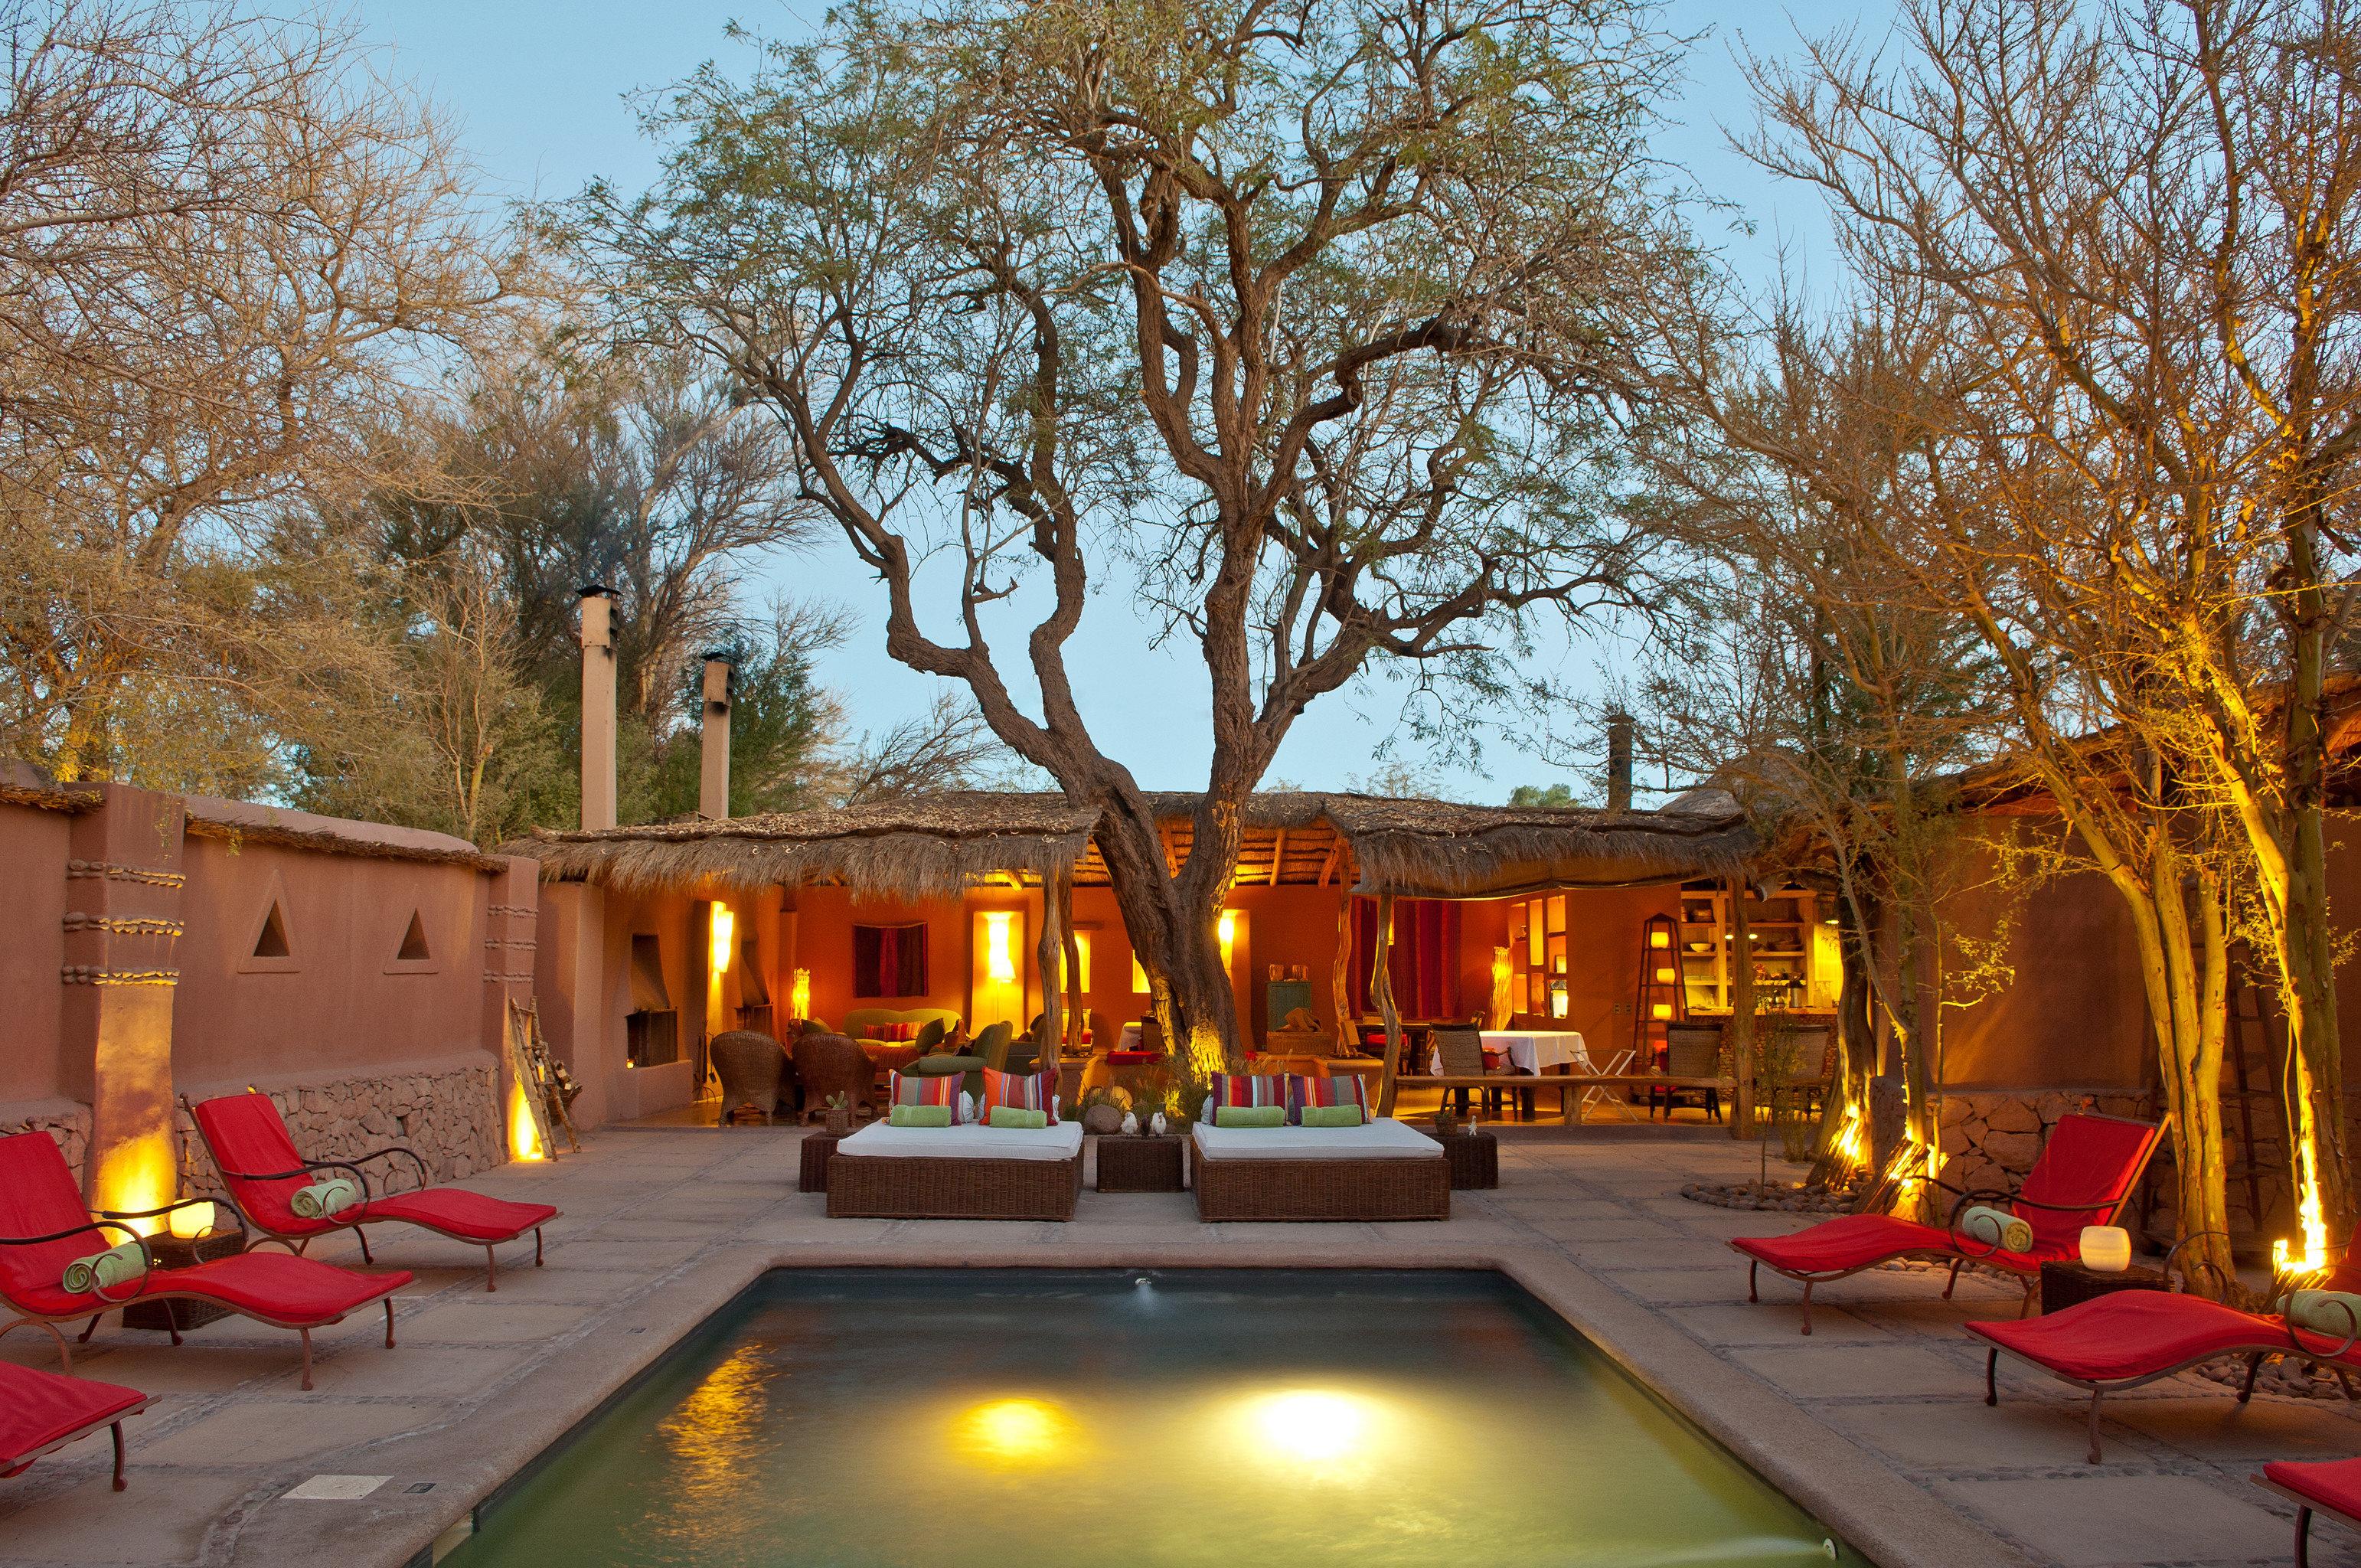 Courtyard Desert Firepit Lounge Outdoors Patio Pool Rustic tree sky street backyard flower hacienda way